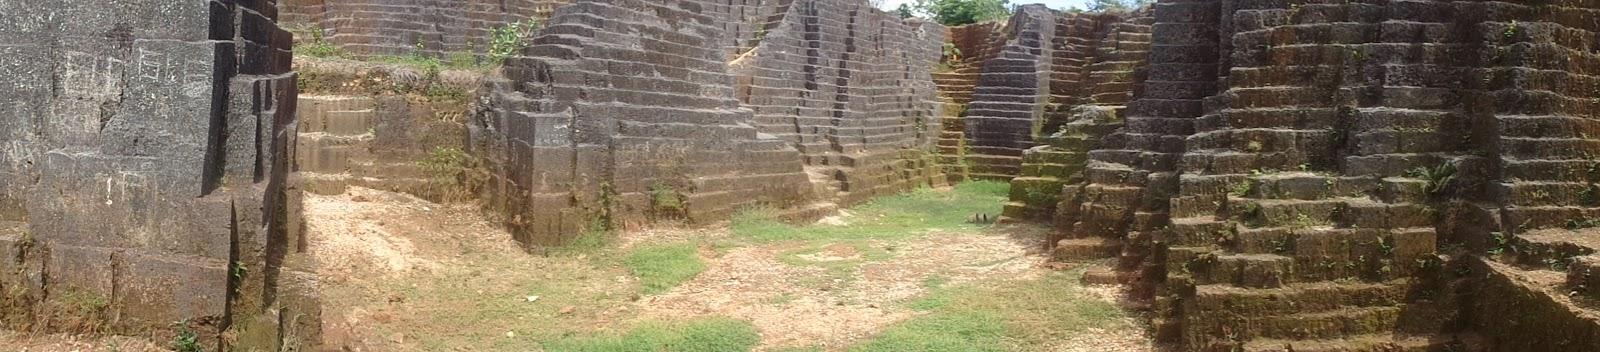 Wisata Watu Giring Yogyakarta Tempat Foto Pre Wedding Selfie Lokasi